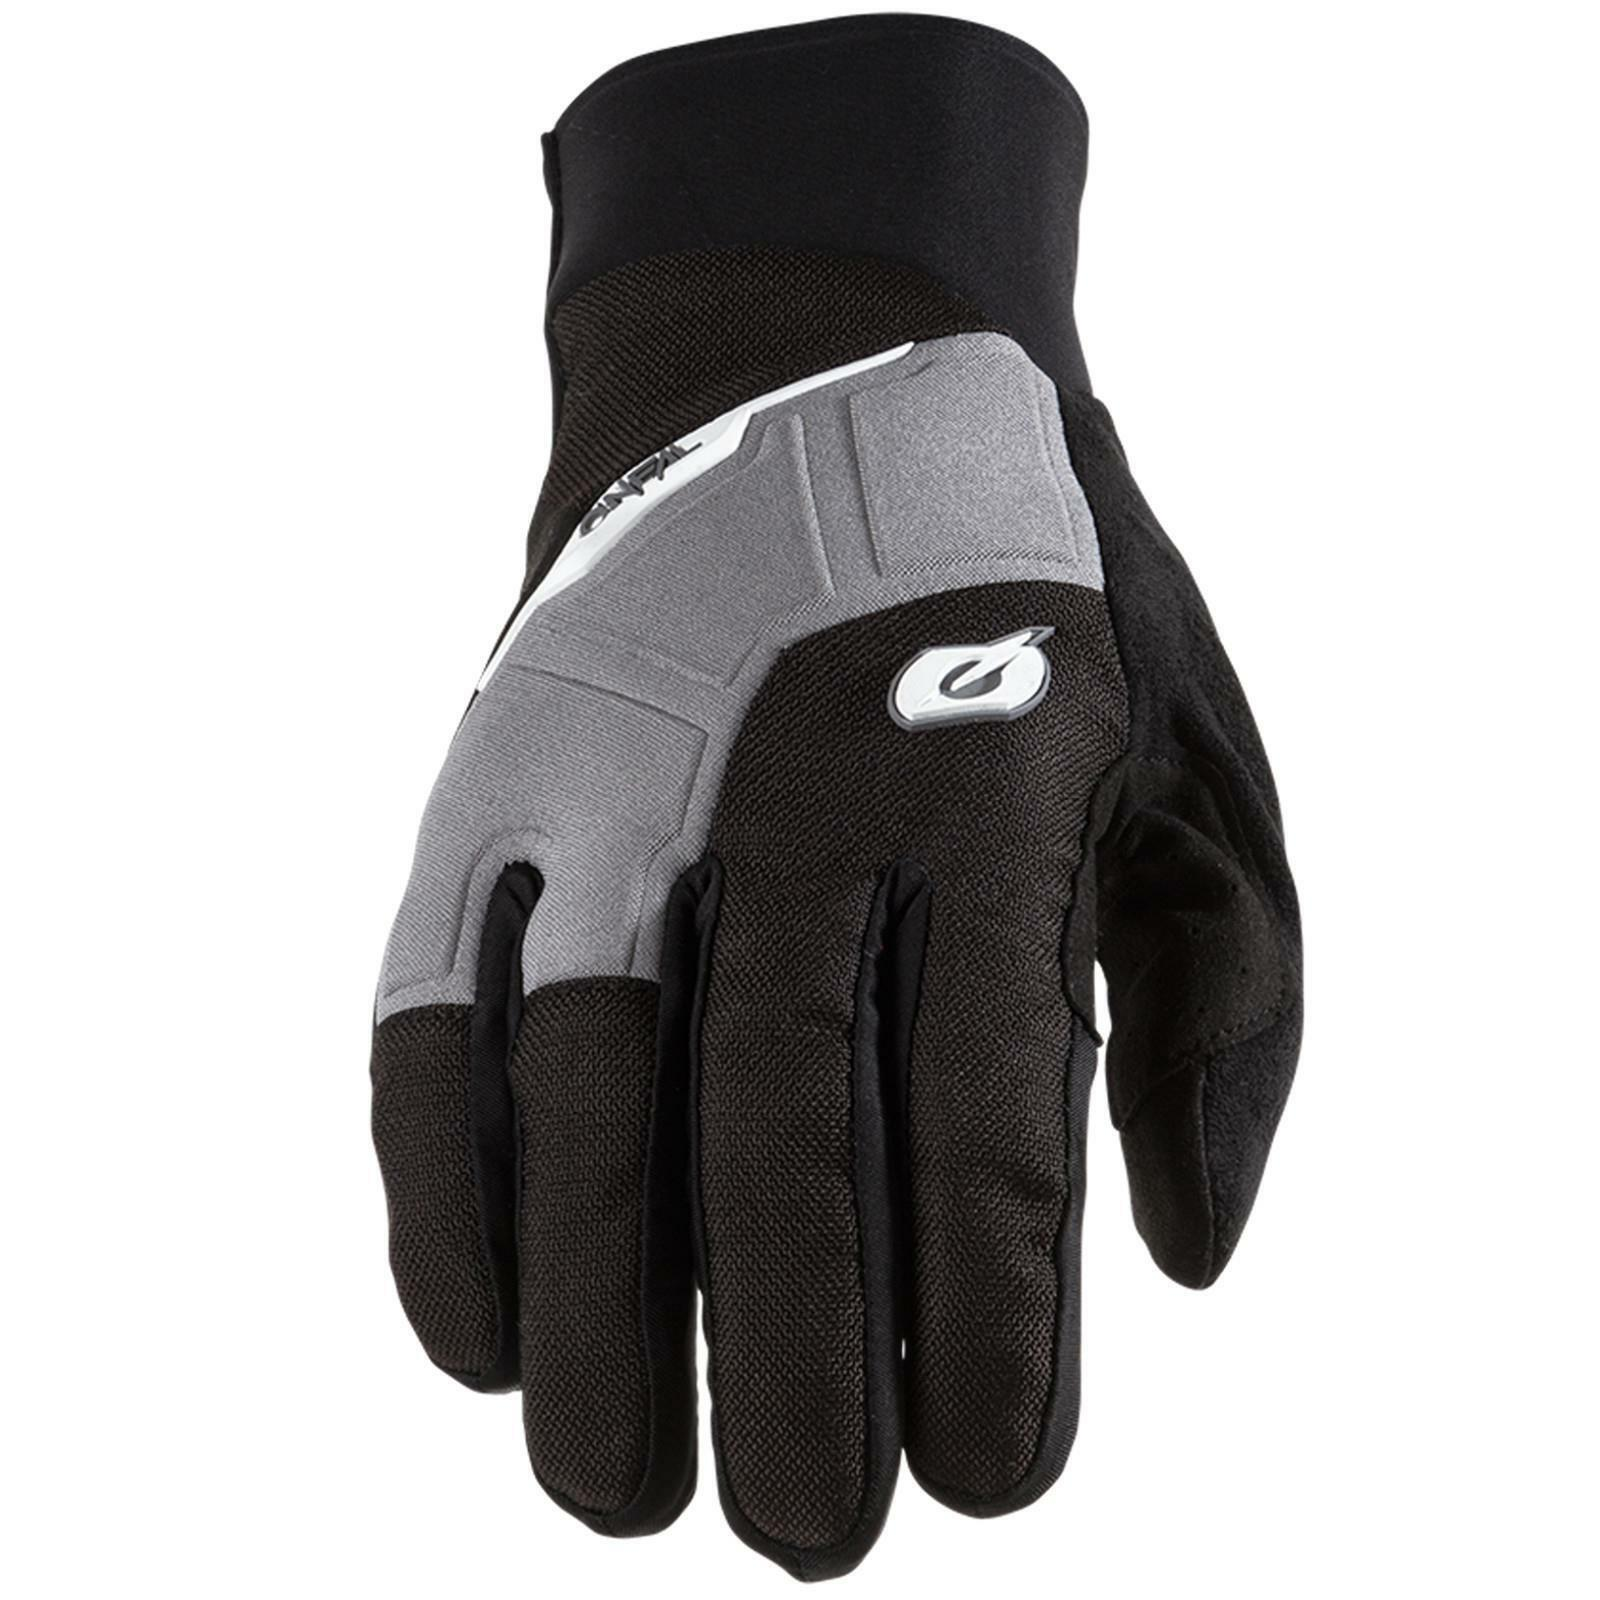 Guantes de invierno oNeal Motocross moto impermeable de Enduro downhill MTB MX